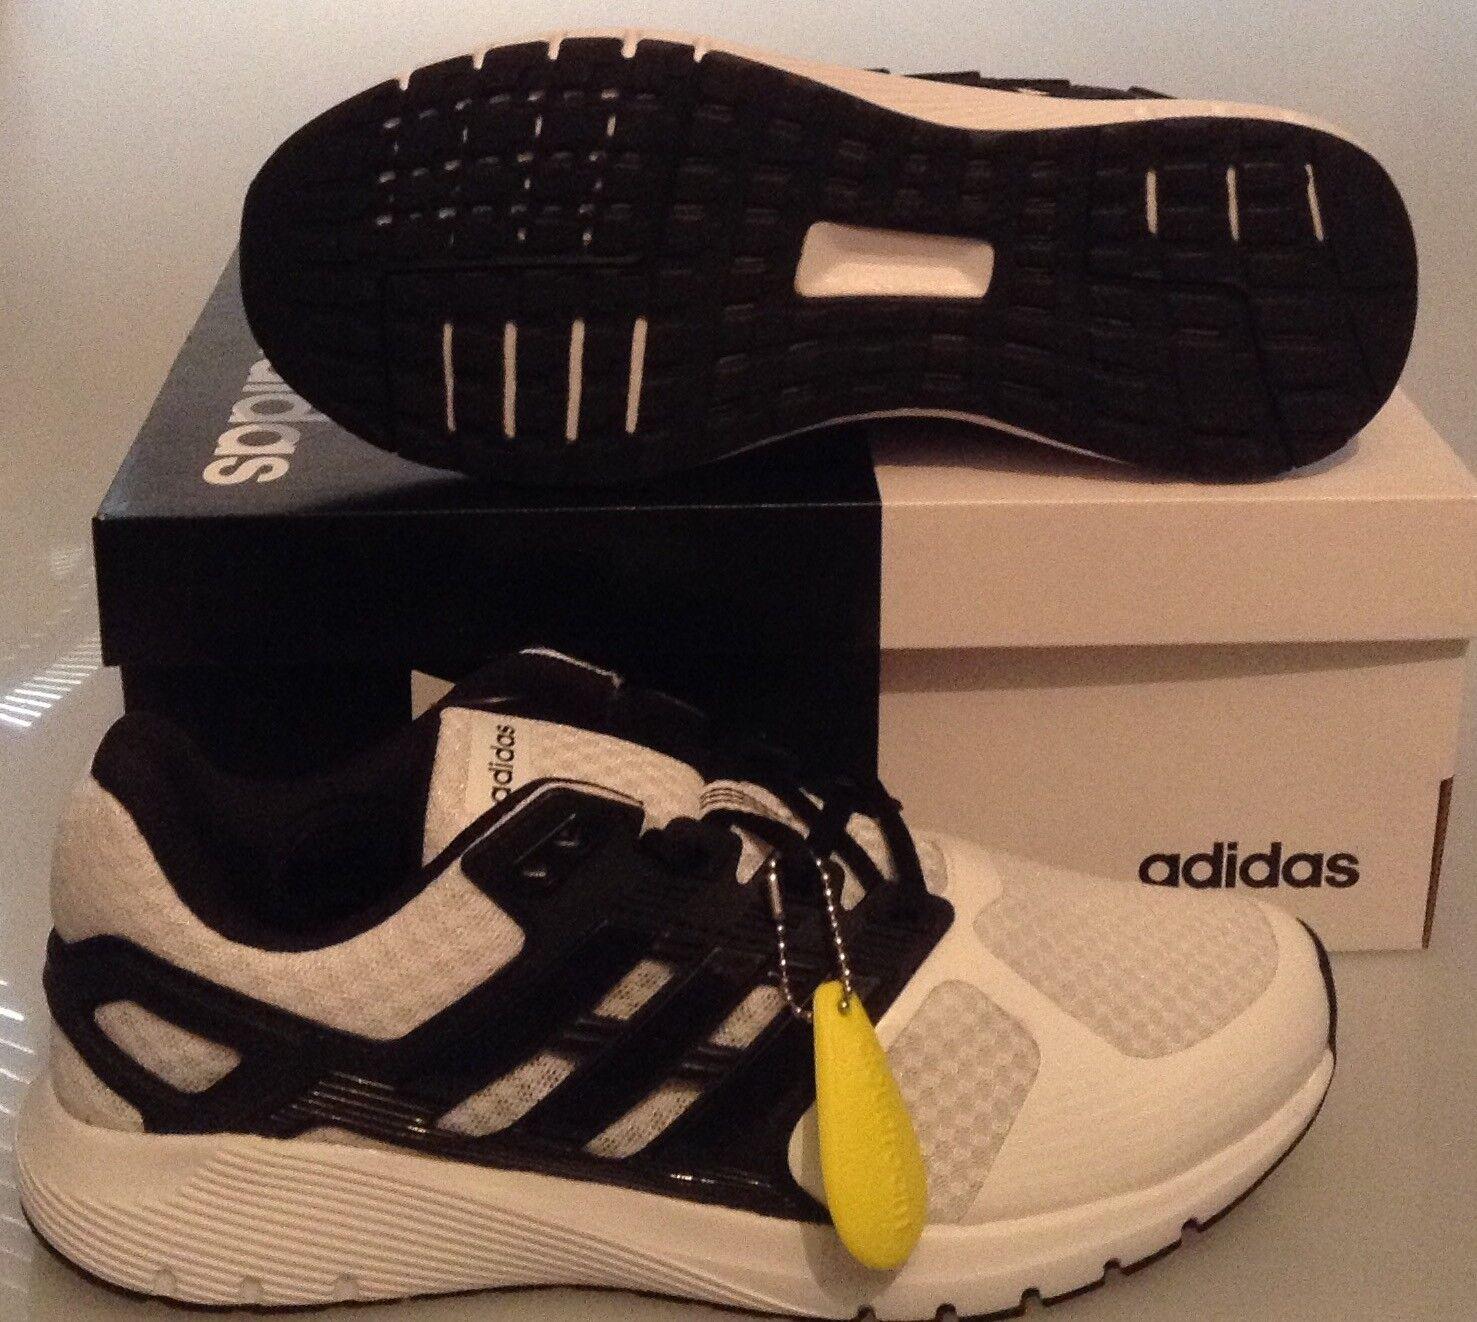 Adidas Adidas Adidas Superstar Vulc Adv homme chaussures noir Core noir Chalk blanc B27390 UK 6 8fb216